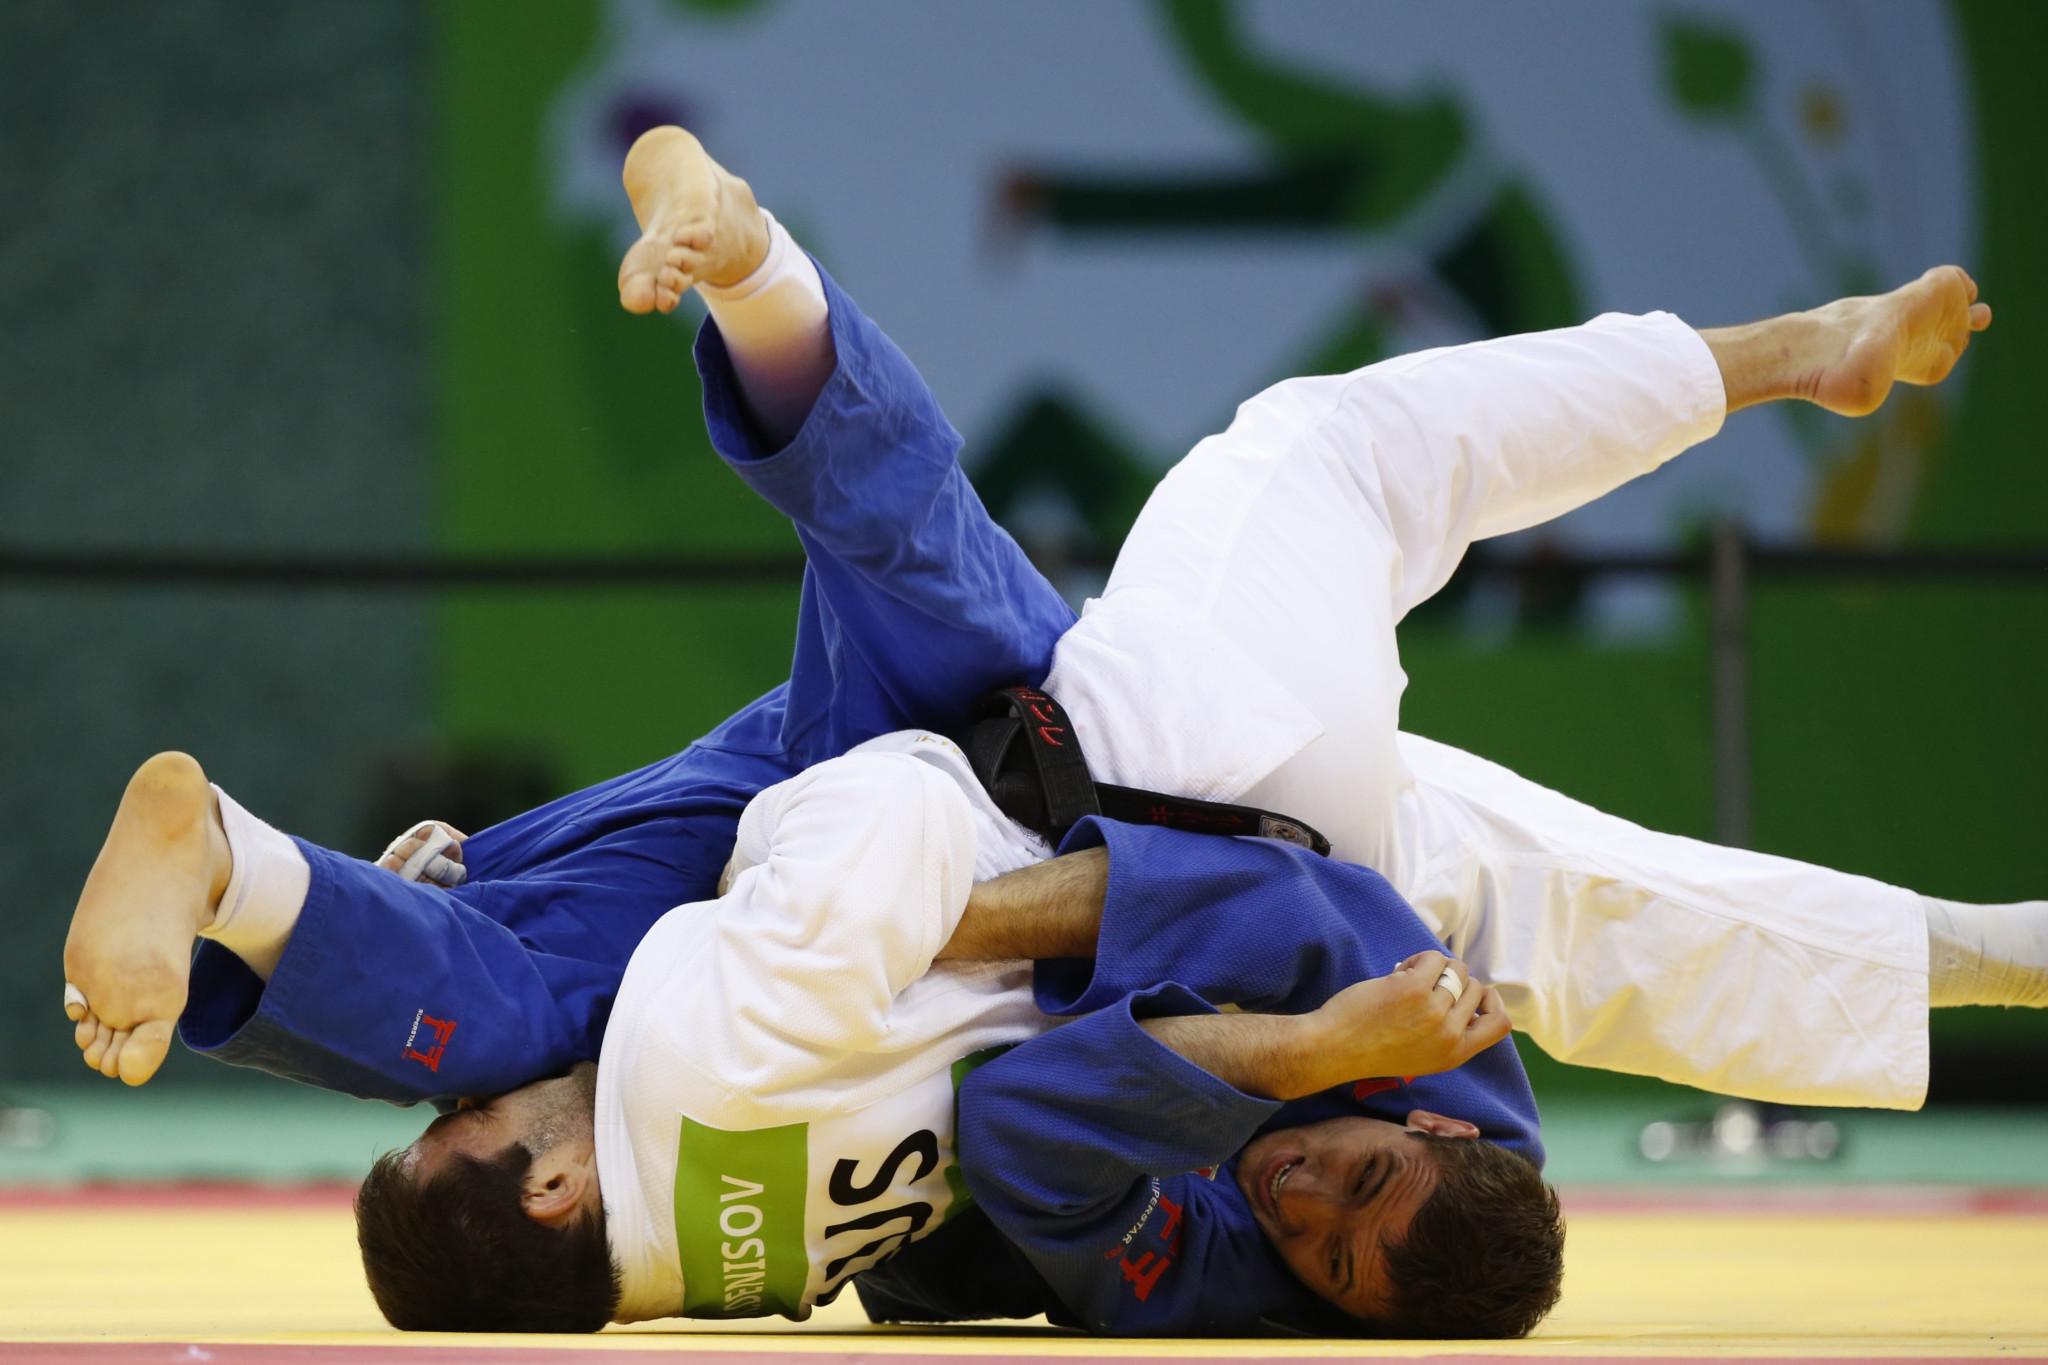 Materik named as an official sponsor of European Judo Union